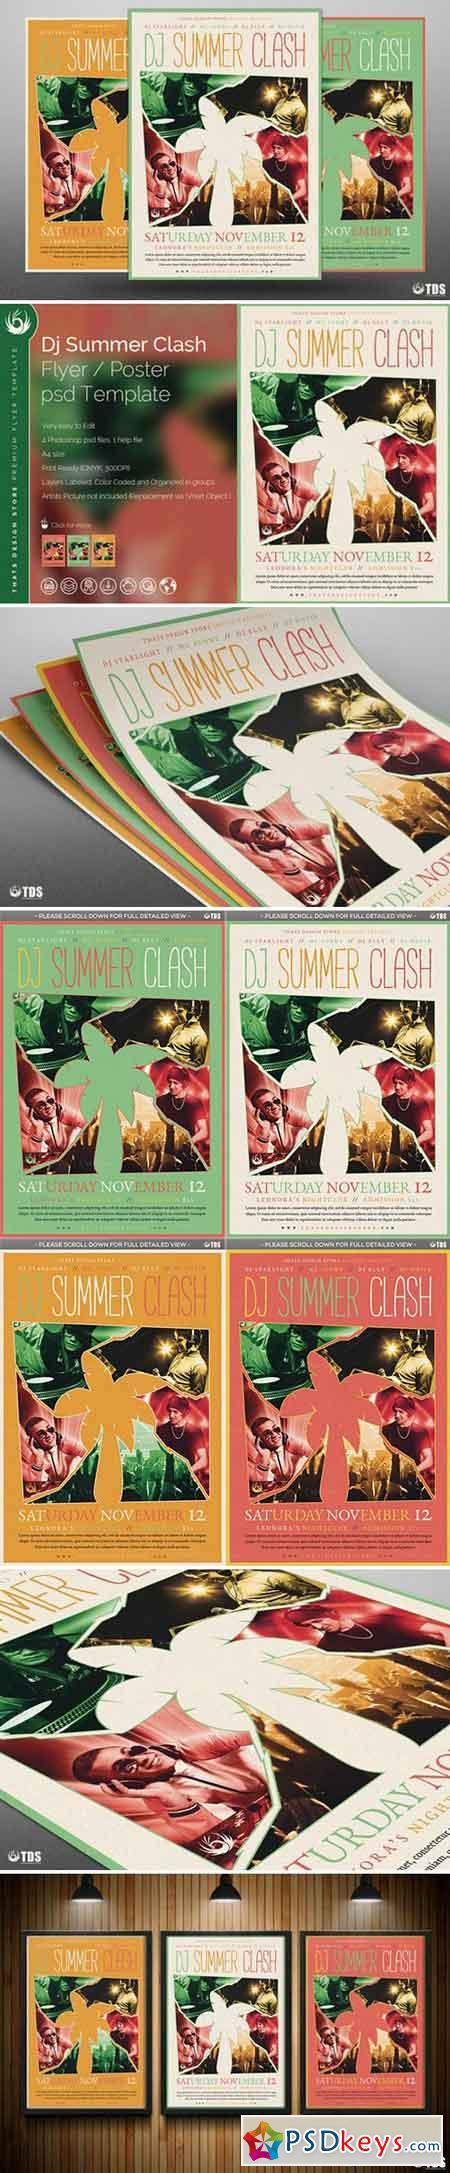 DJ Summer Clash Flyer Template 691262